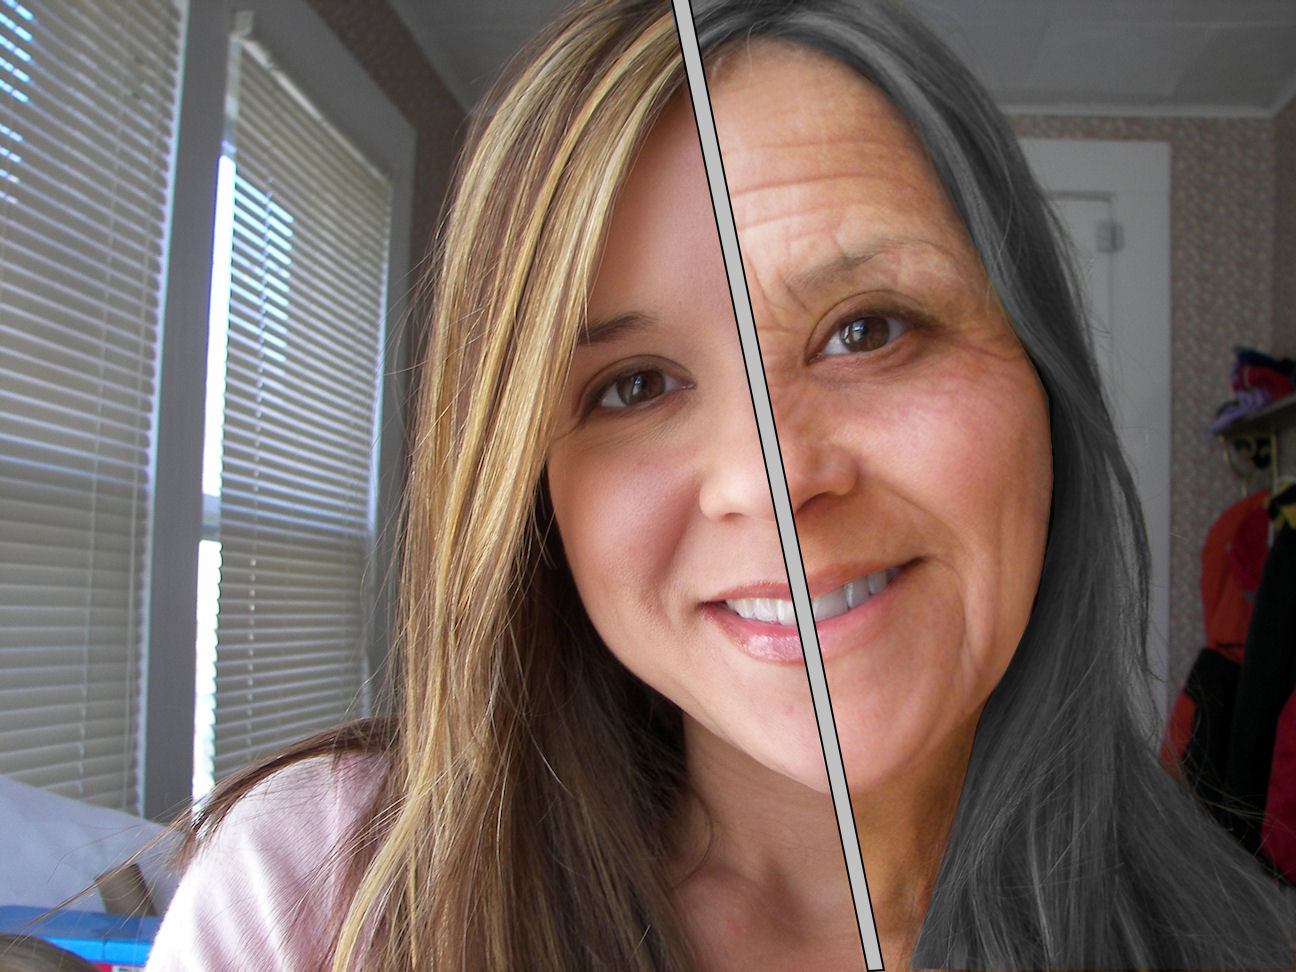 Mature woman vs young girl 50 - 2 6